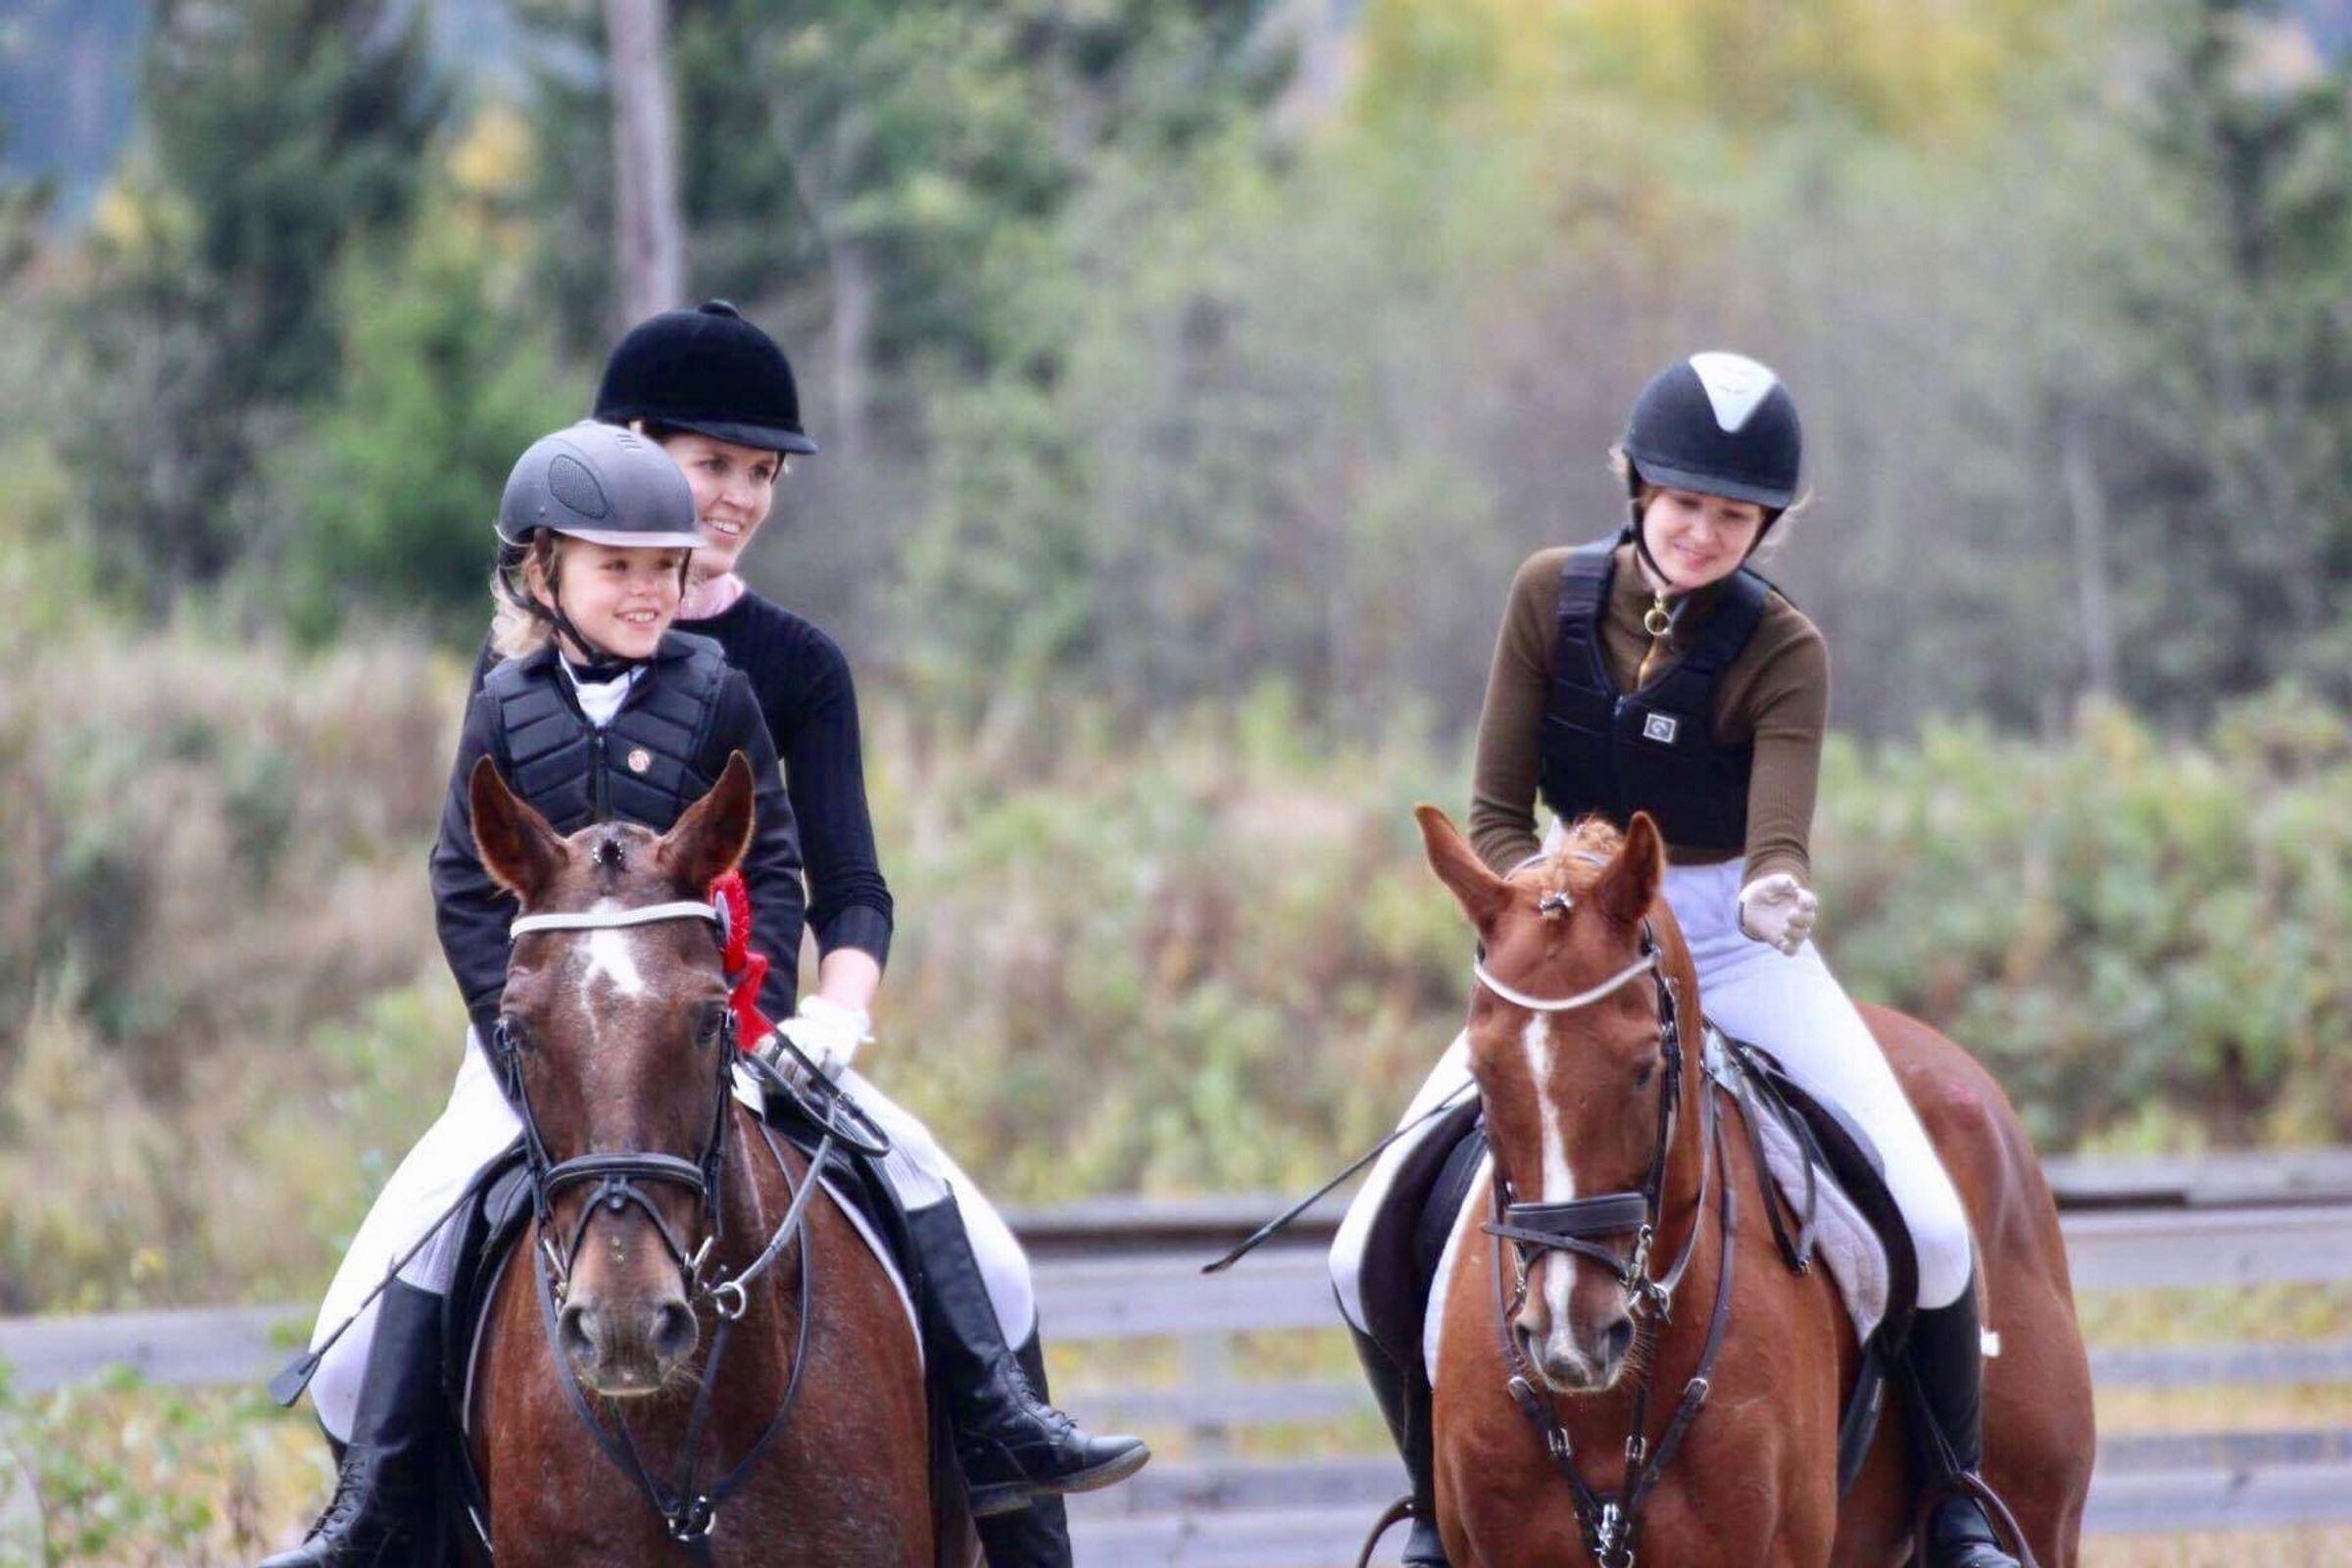 Stall Kankerud rideskolen i Gausdal